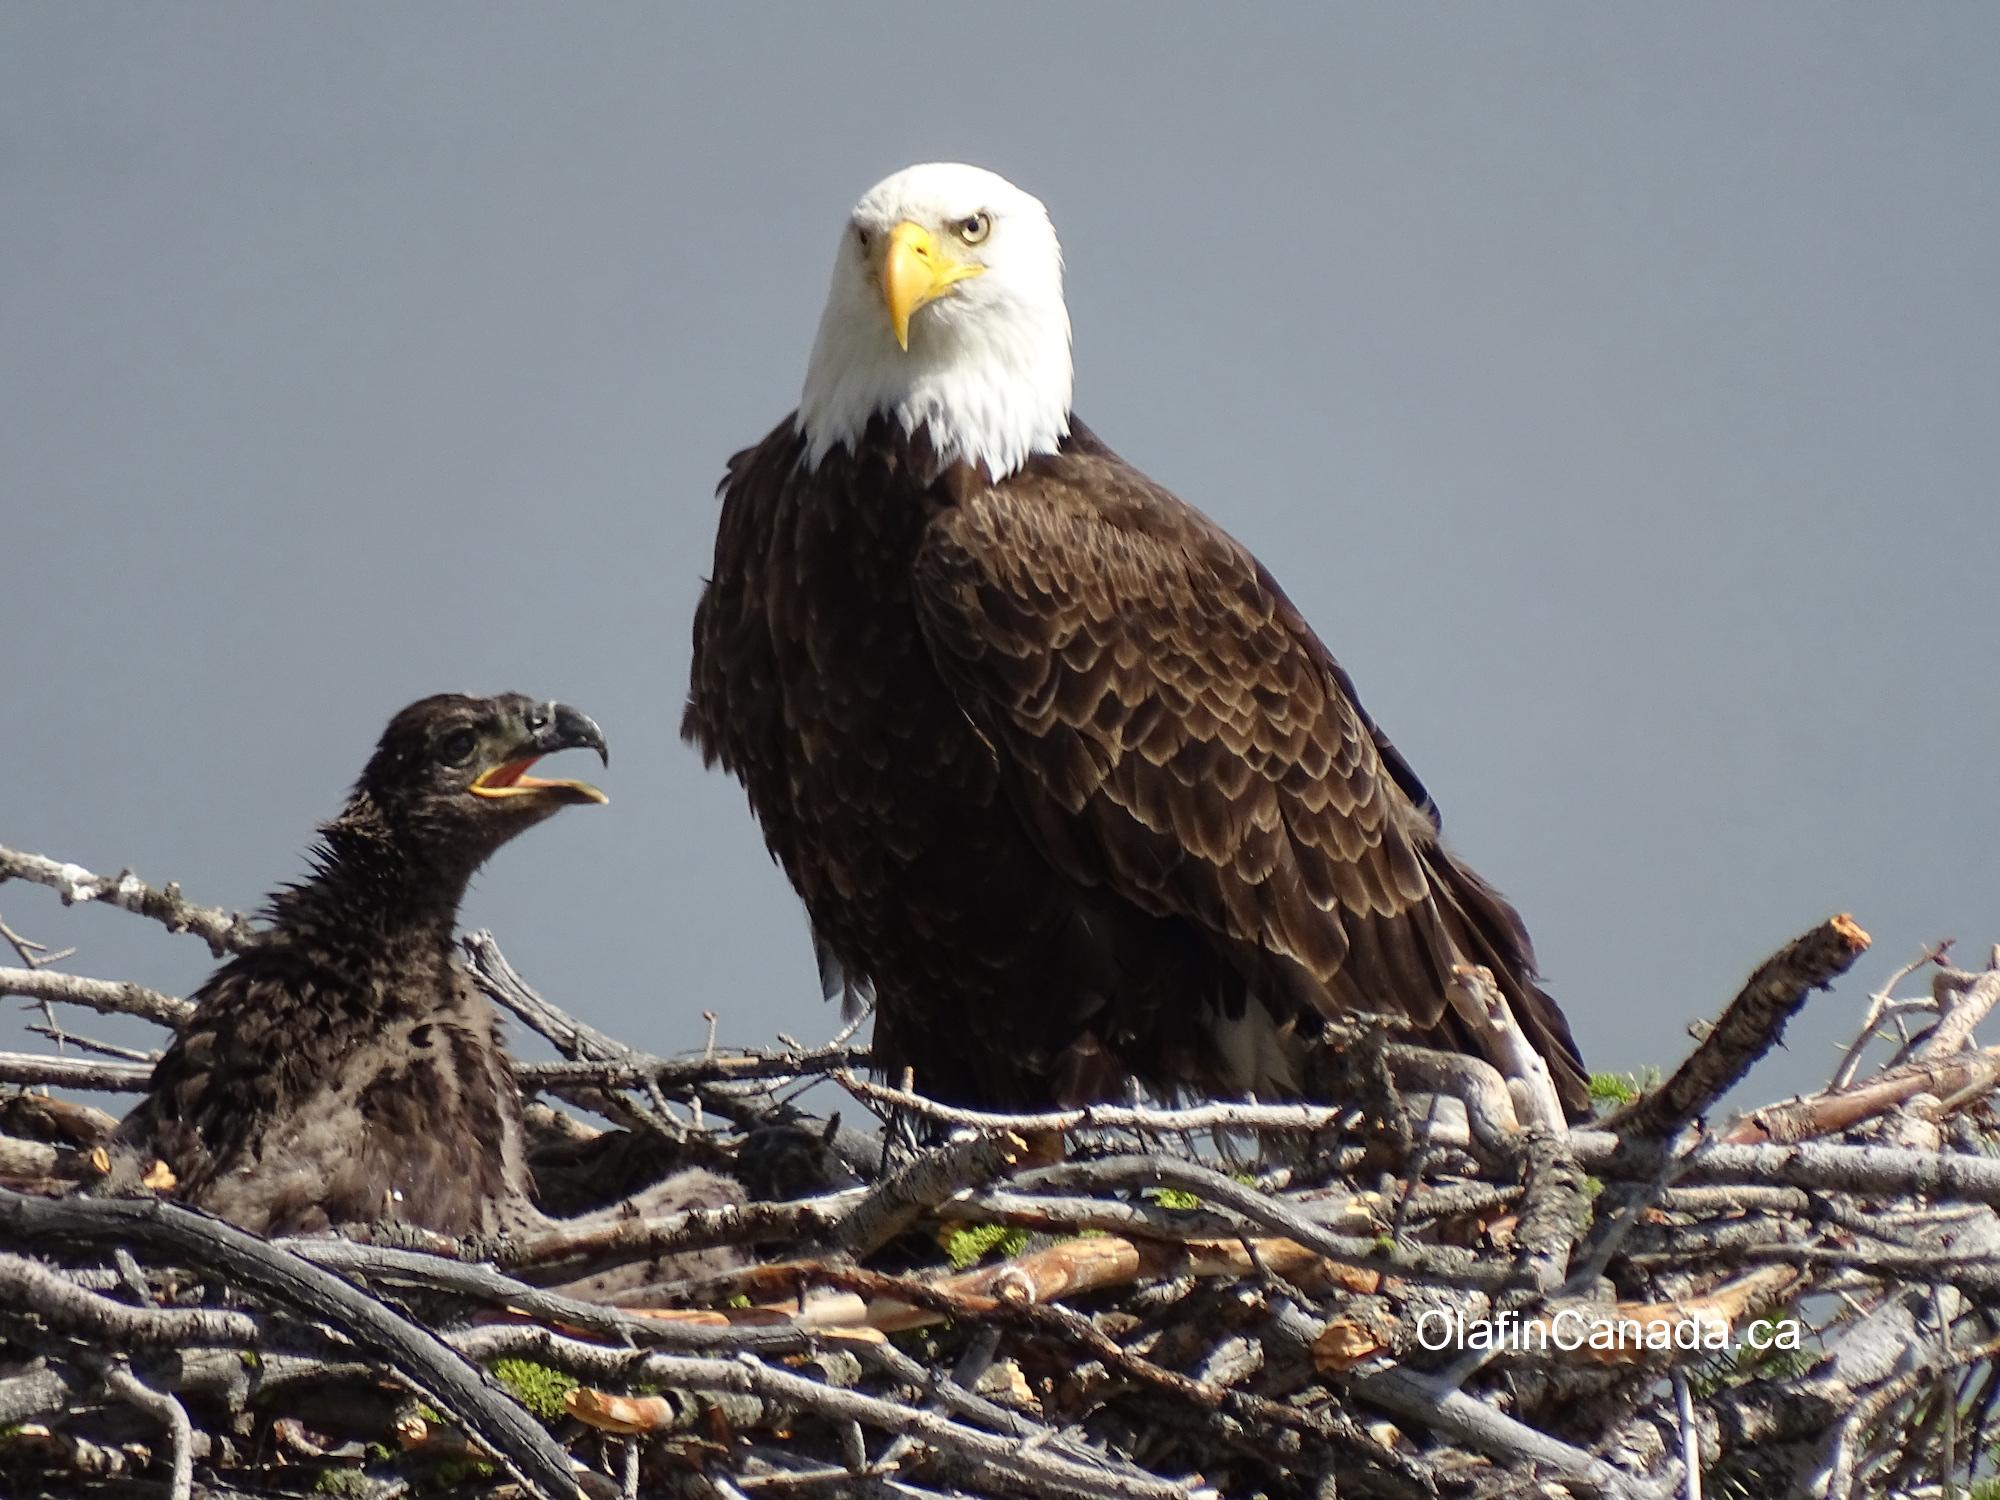 Bald eagle with hungry young on nest next to Okanagan Lake #olafincanada #britishcolumbia #discoverbc #wildlife #baldeagle #okanagan